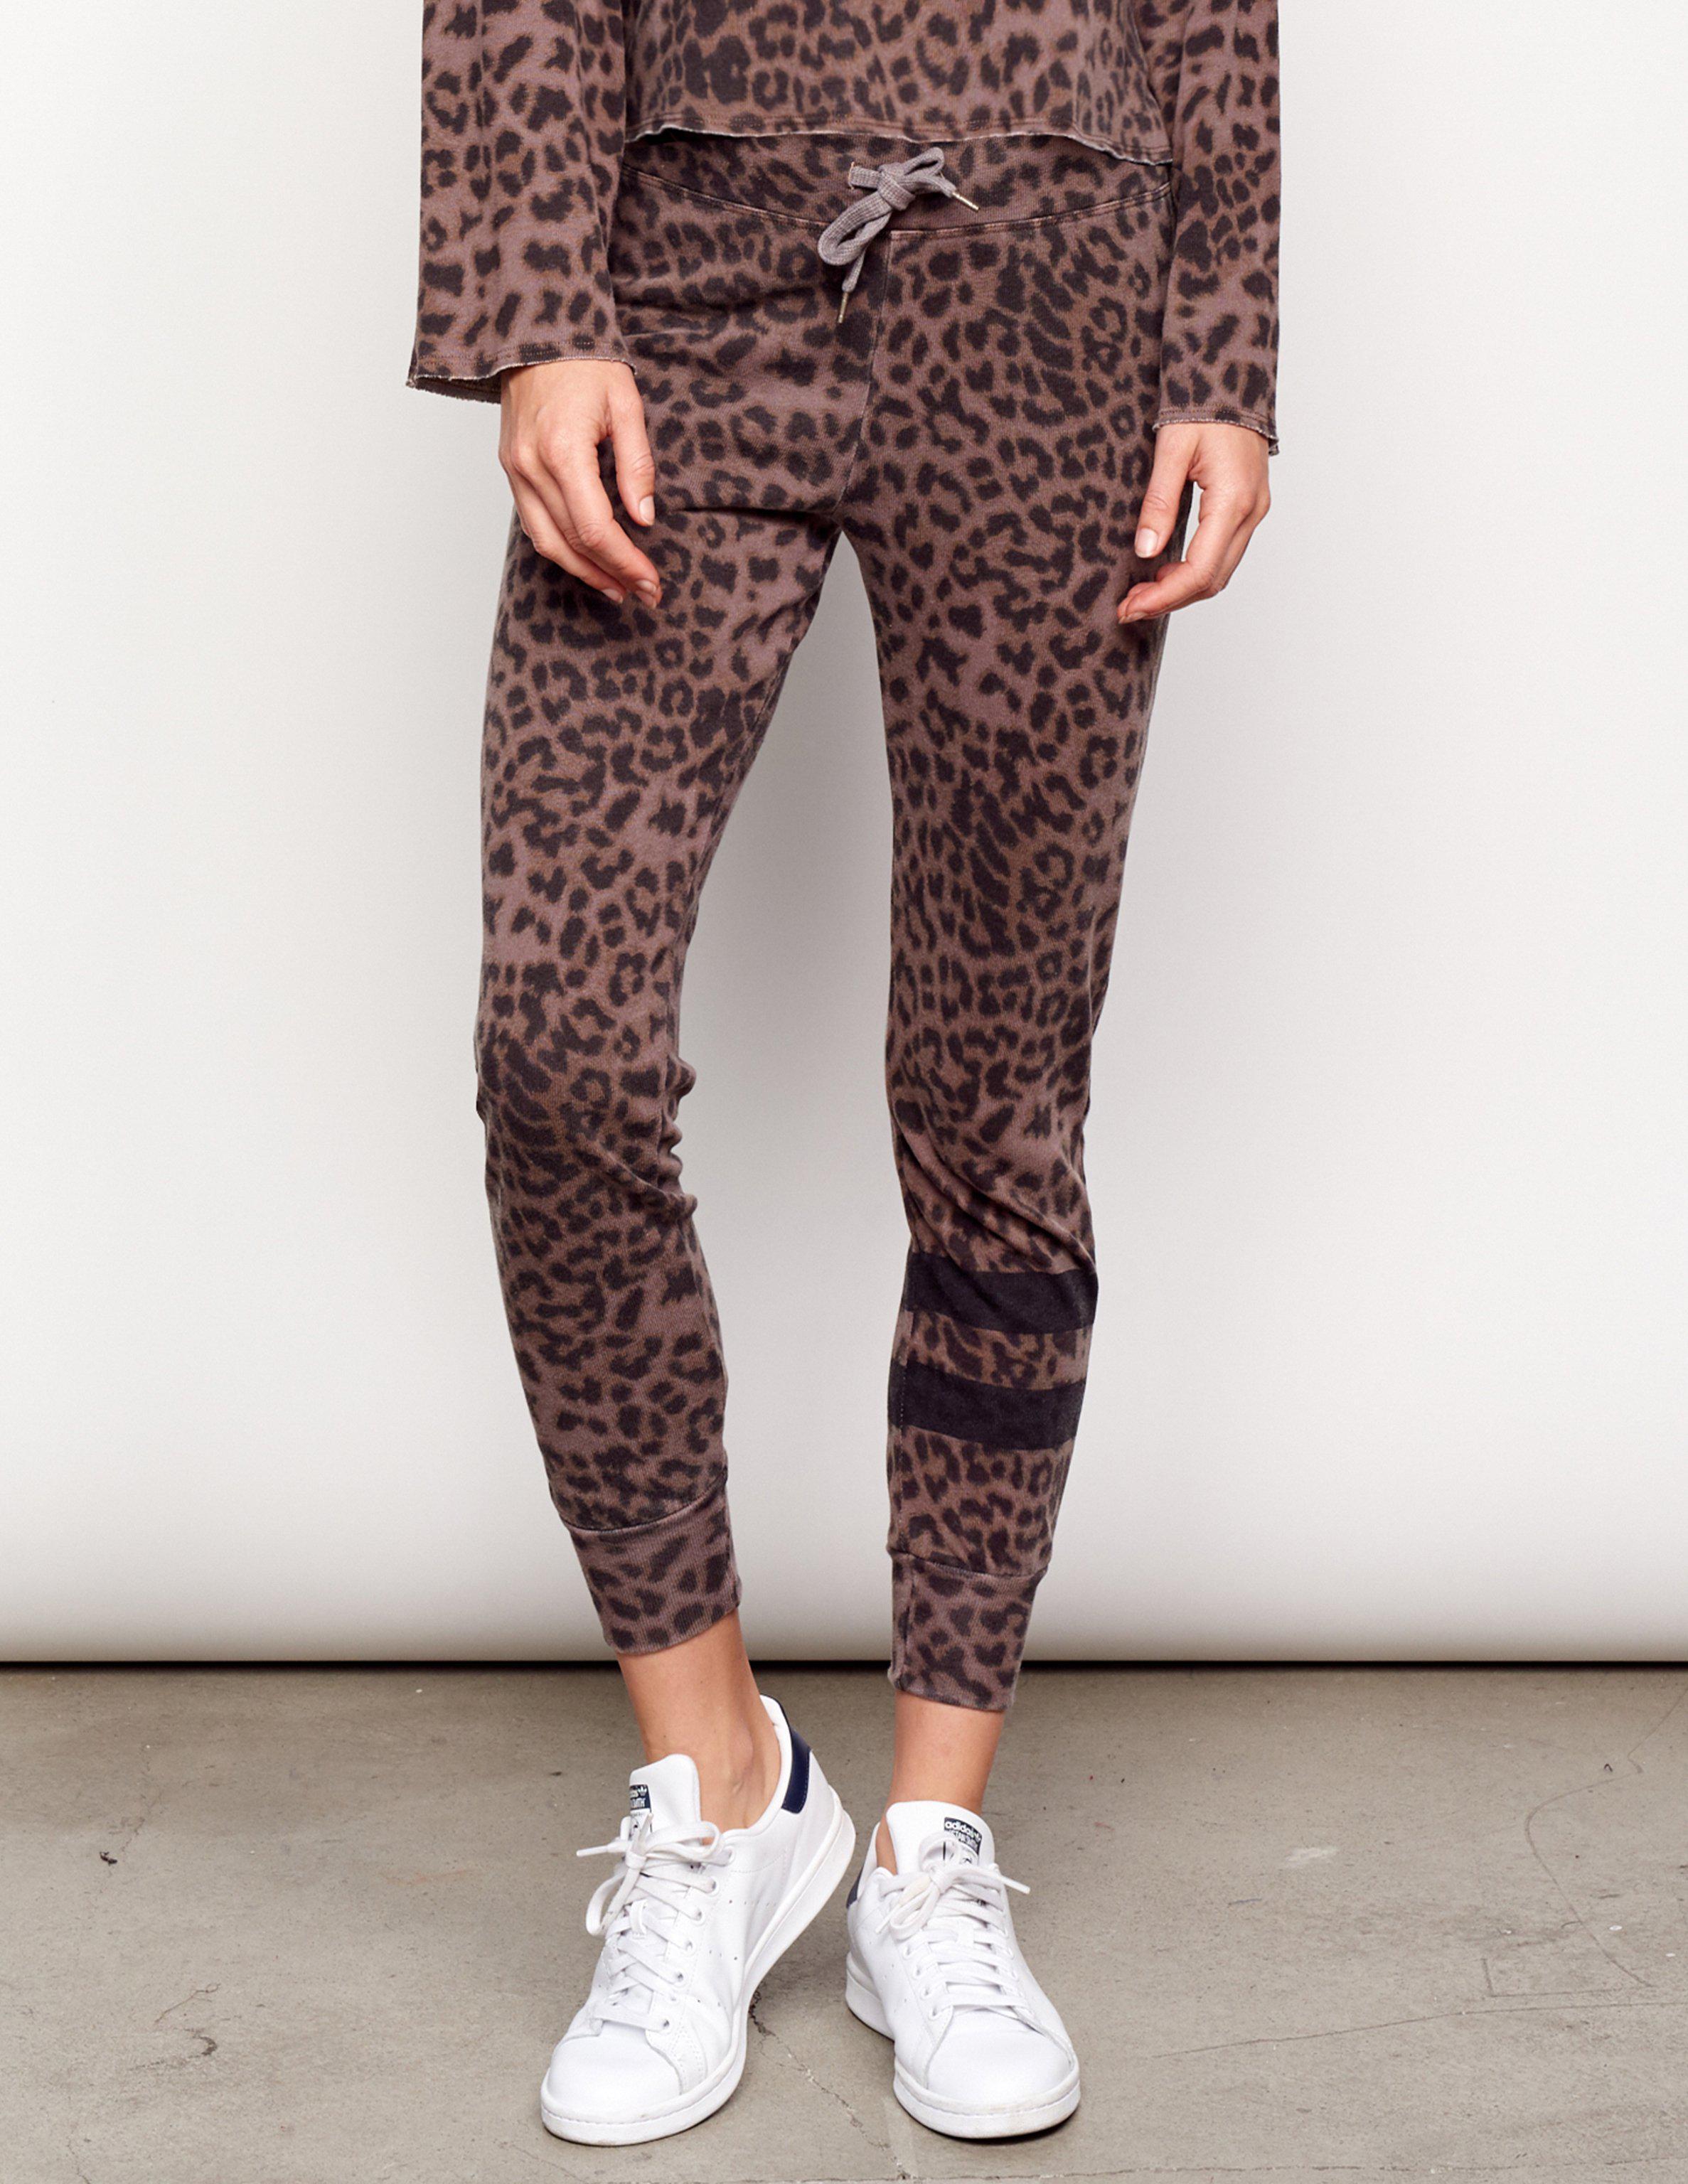 b919eda6feed Lyst - Sundry Leopard Stripes Jogger Pant